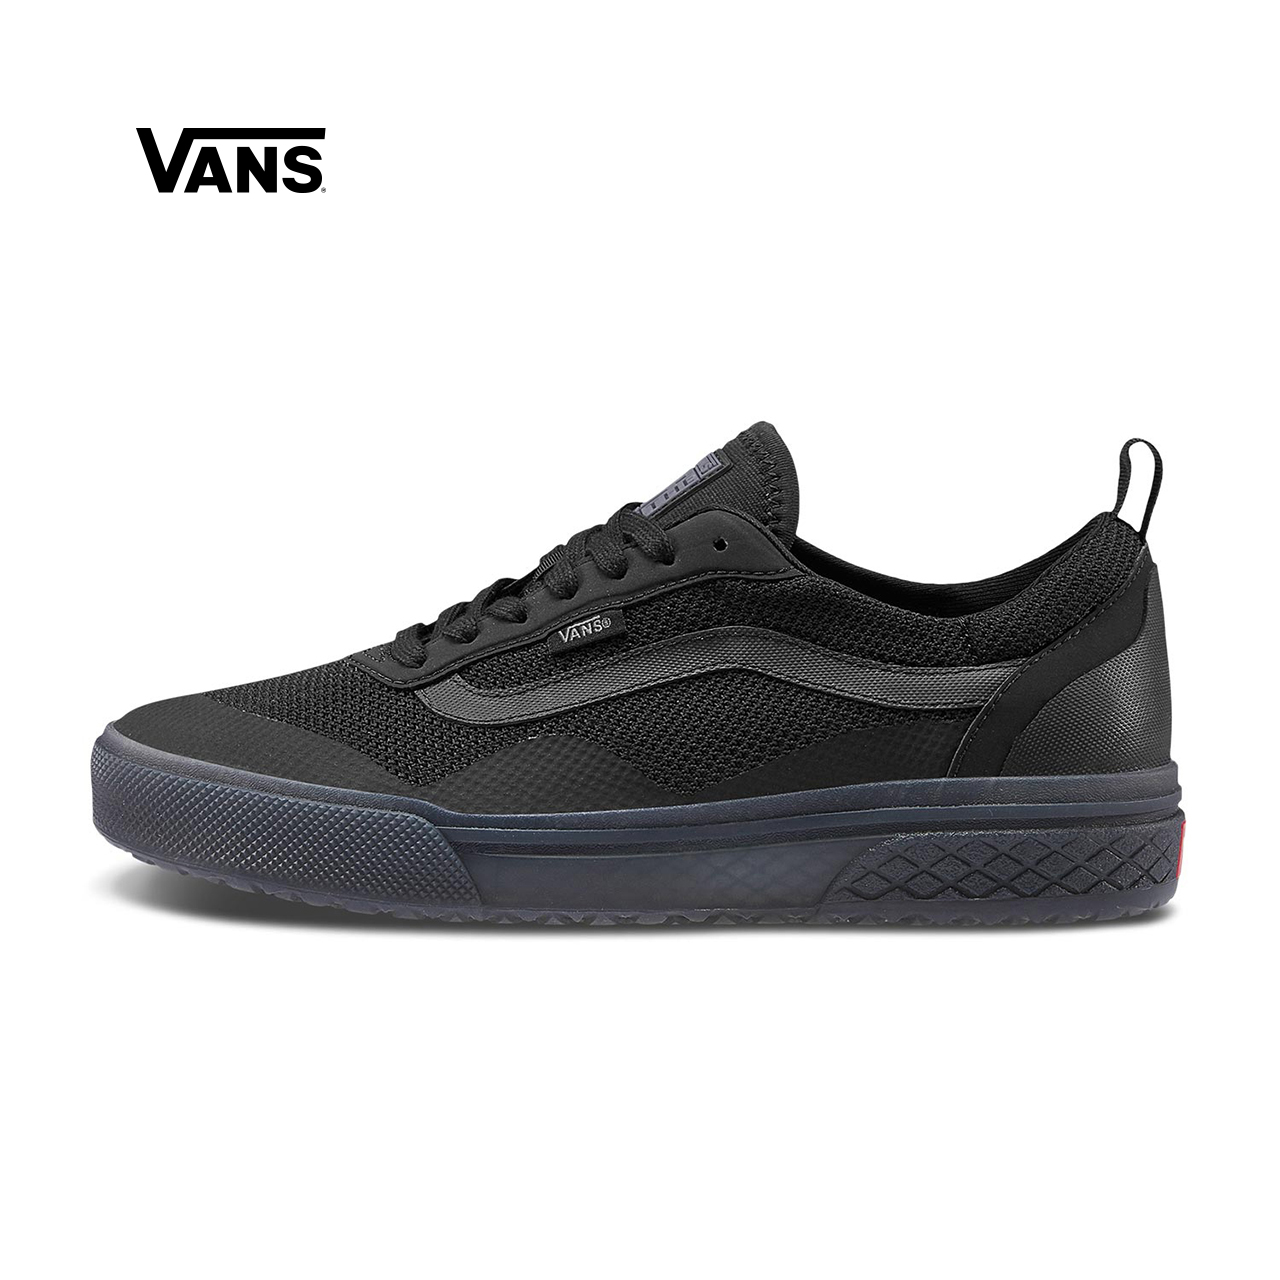 vans范斯运动休闲系列低帮运动鞋券后695.00元